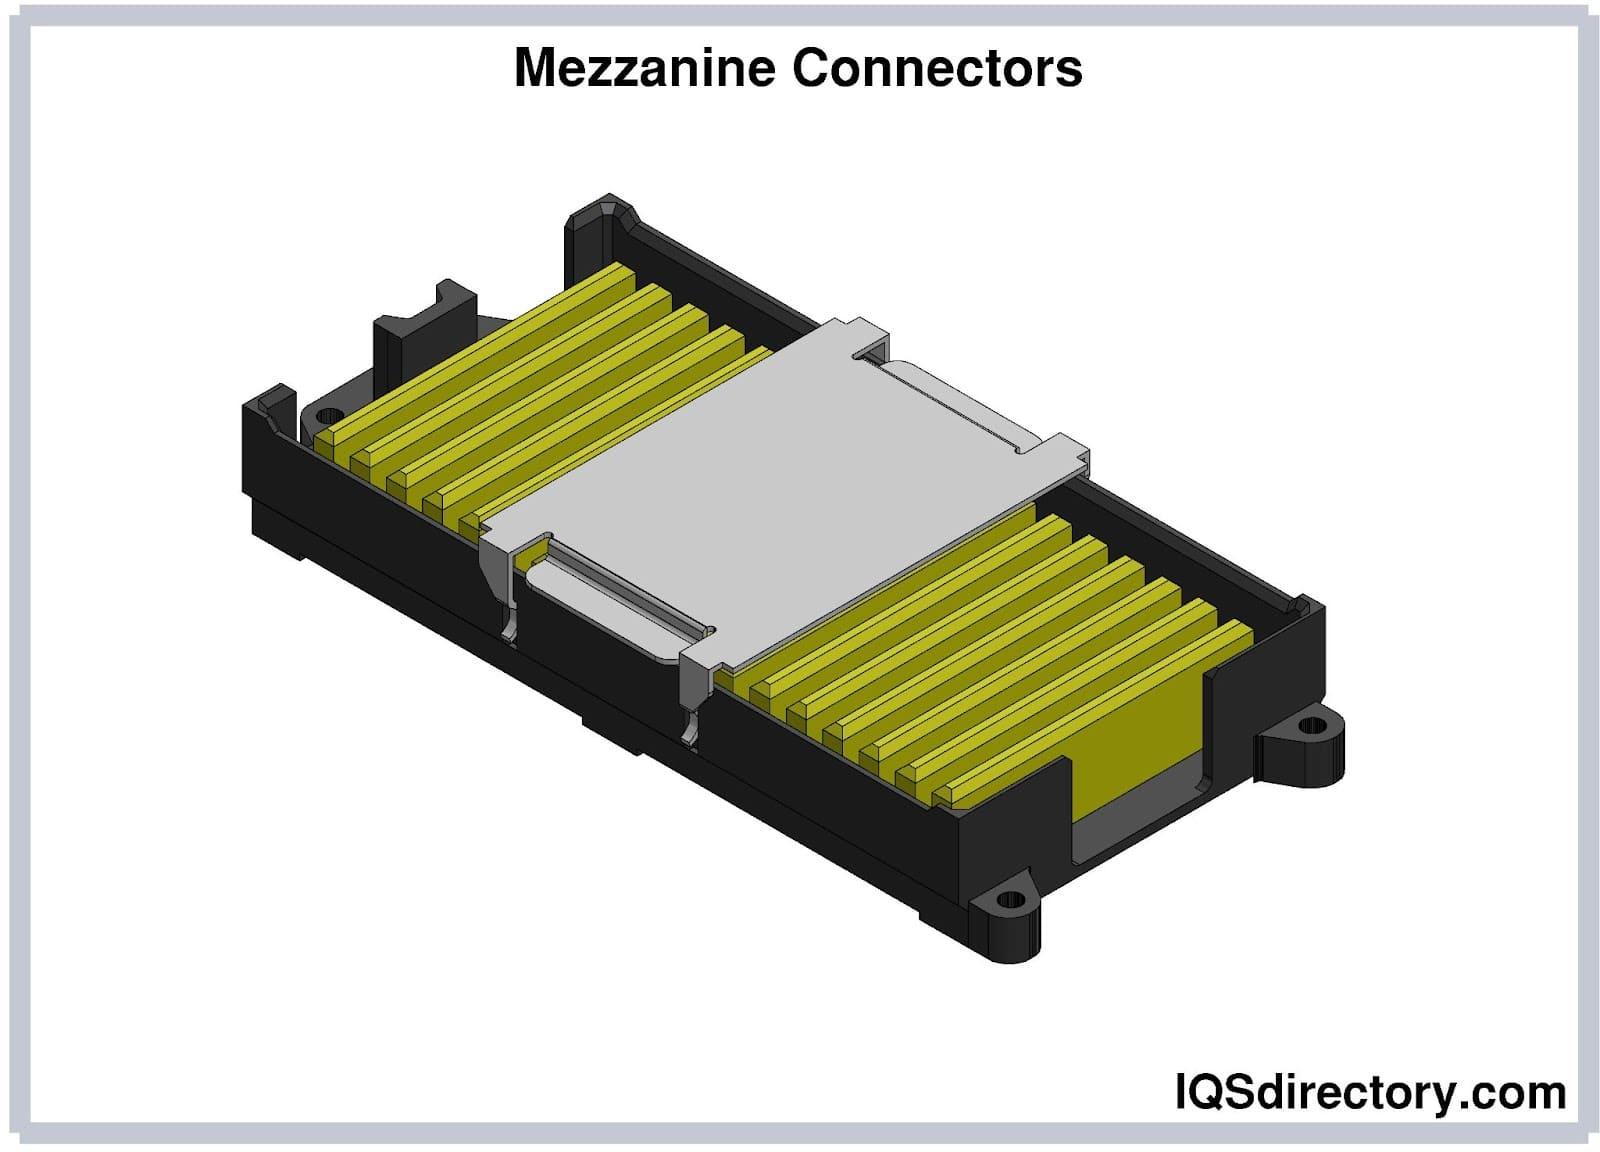 Mezzanine Connectors